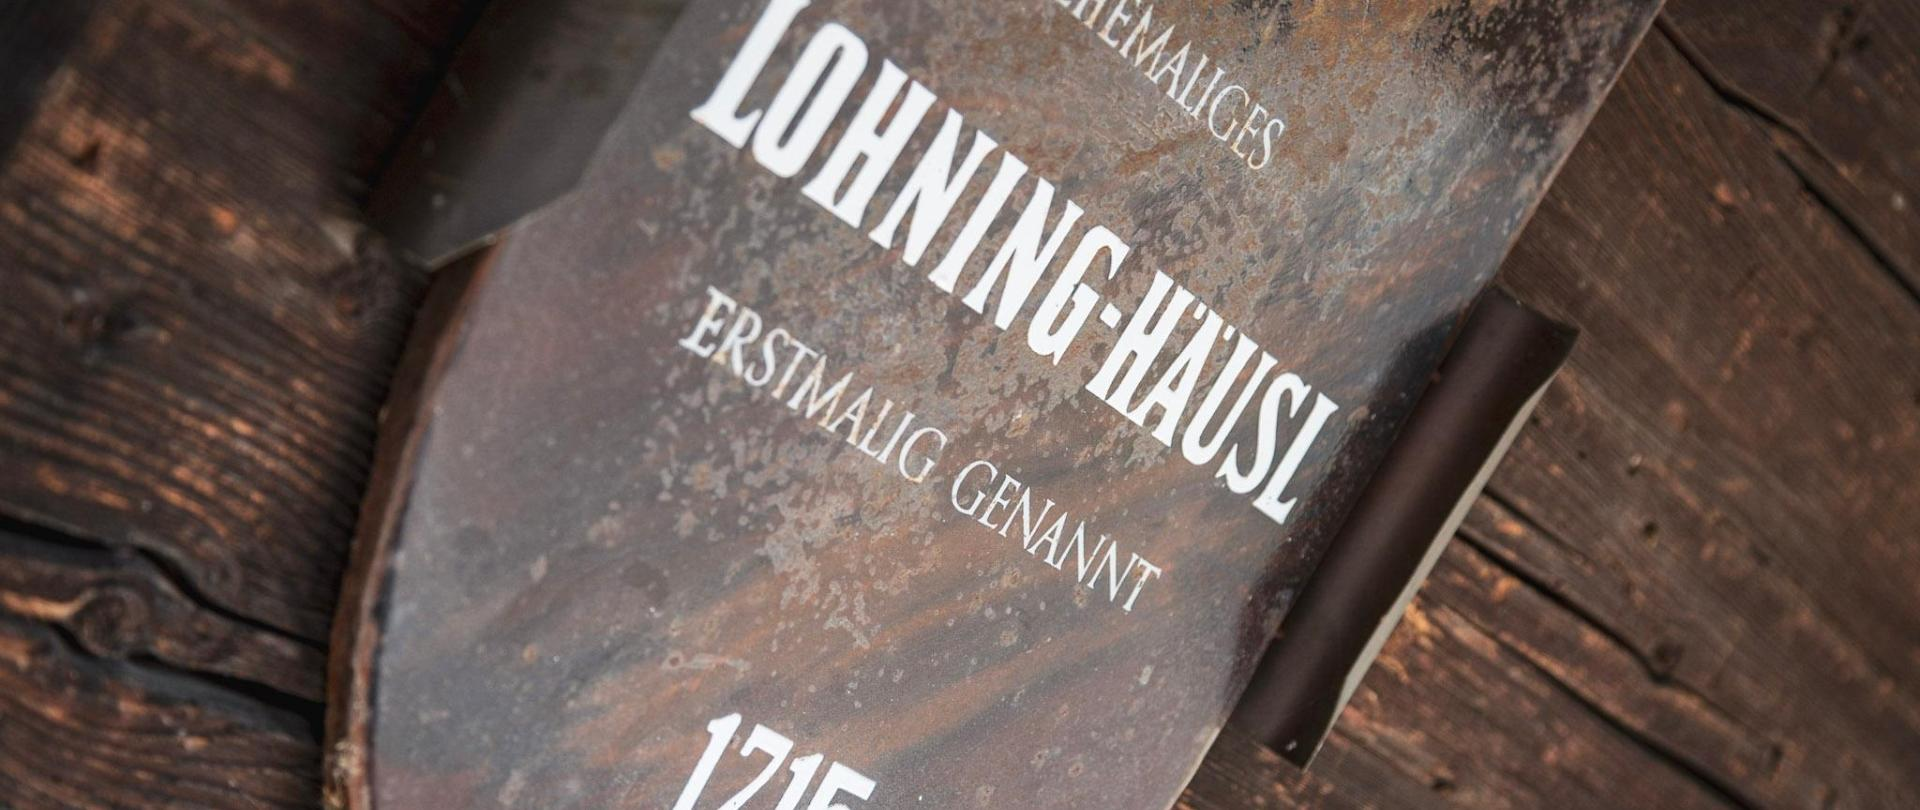 Lohninghaus.jpg